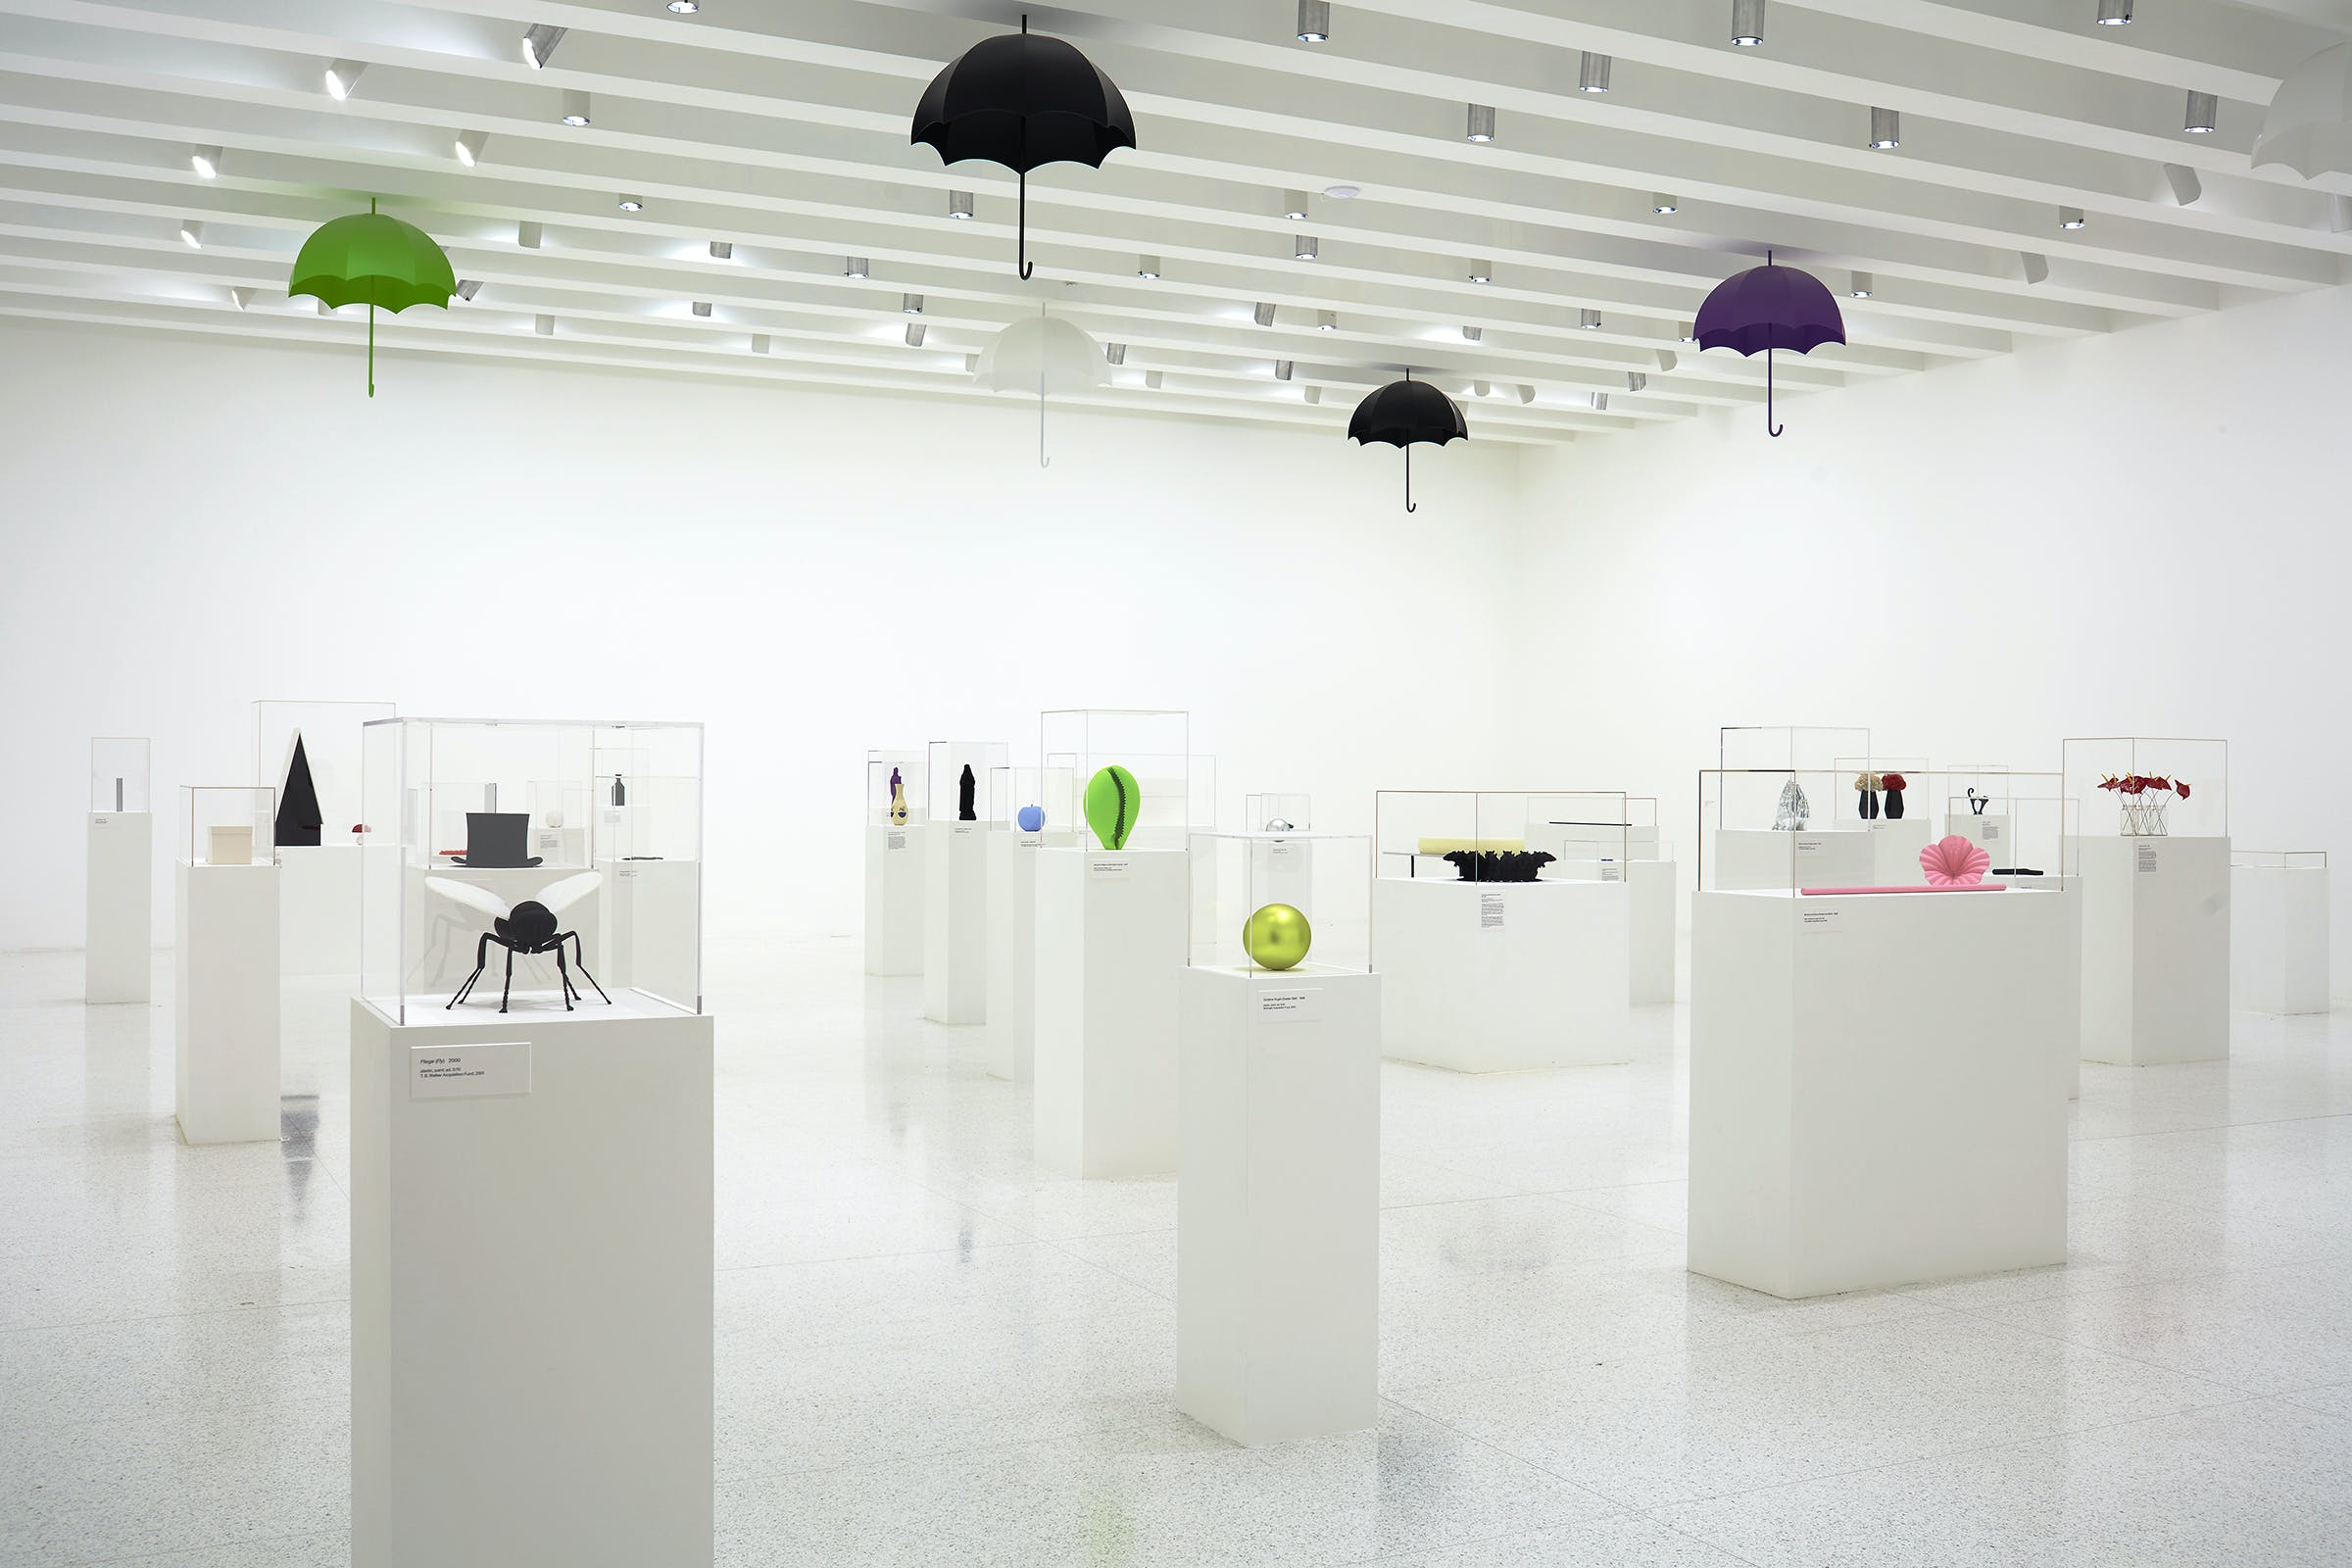 Installation view of the exhibition Katharina Fritsch: Multiples, 2017 (Photo: Gene Pittman, ©Walker Art Center)